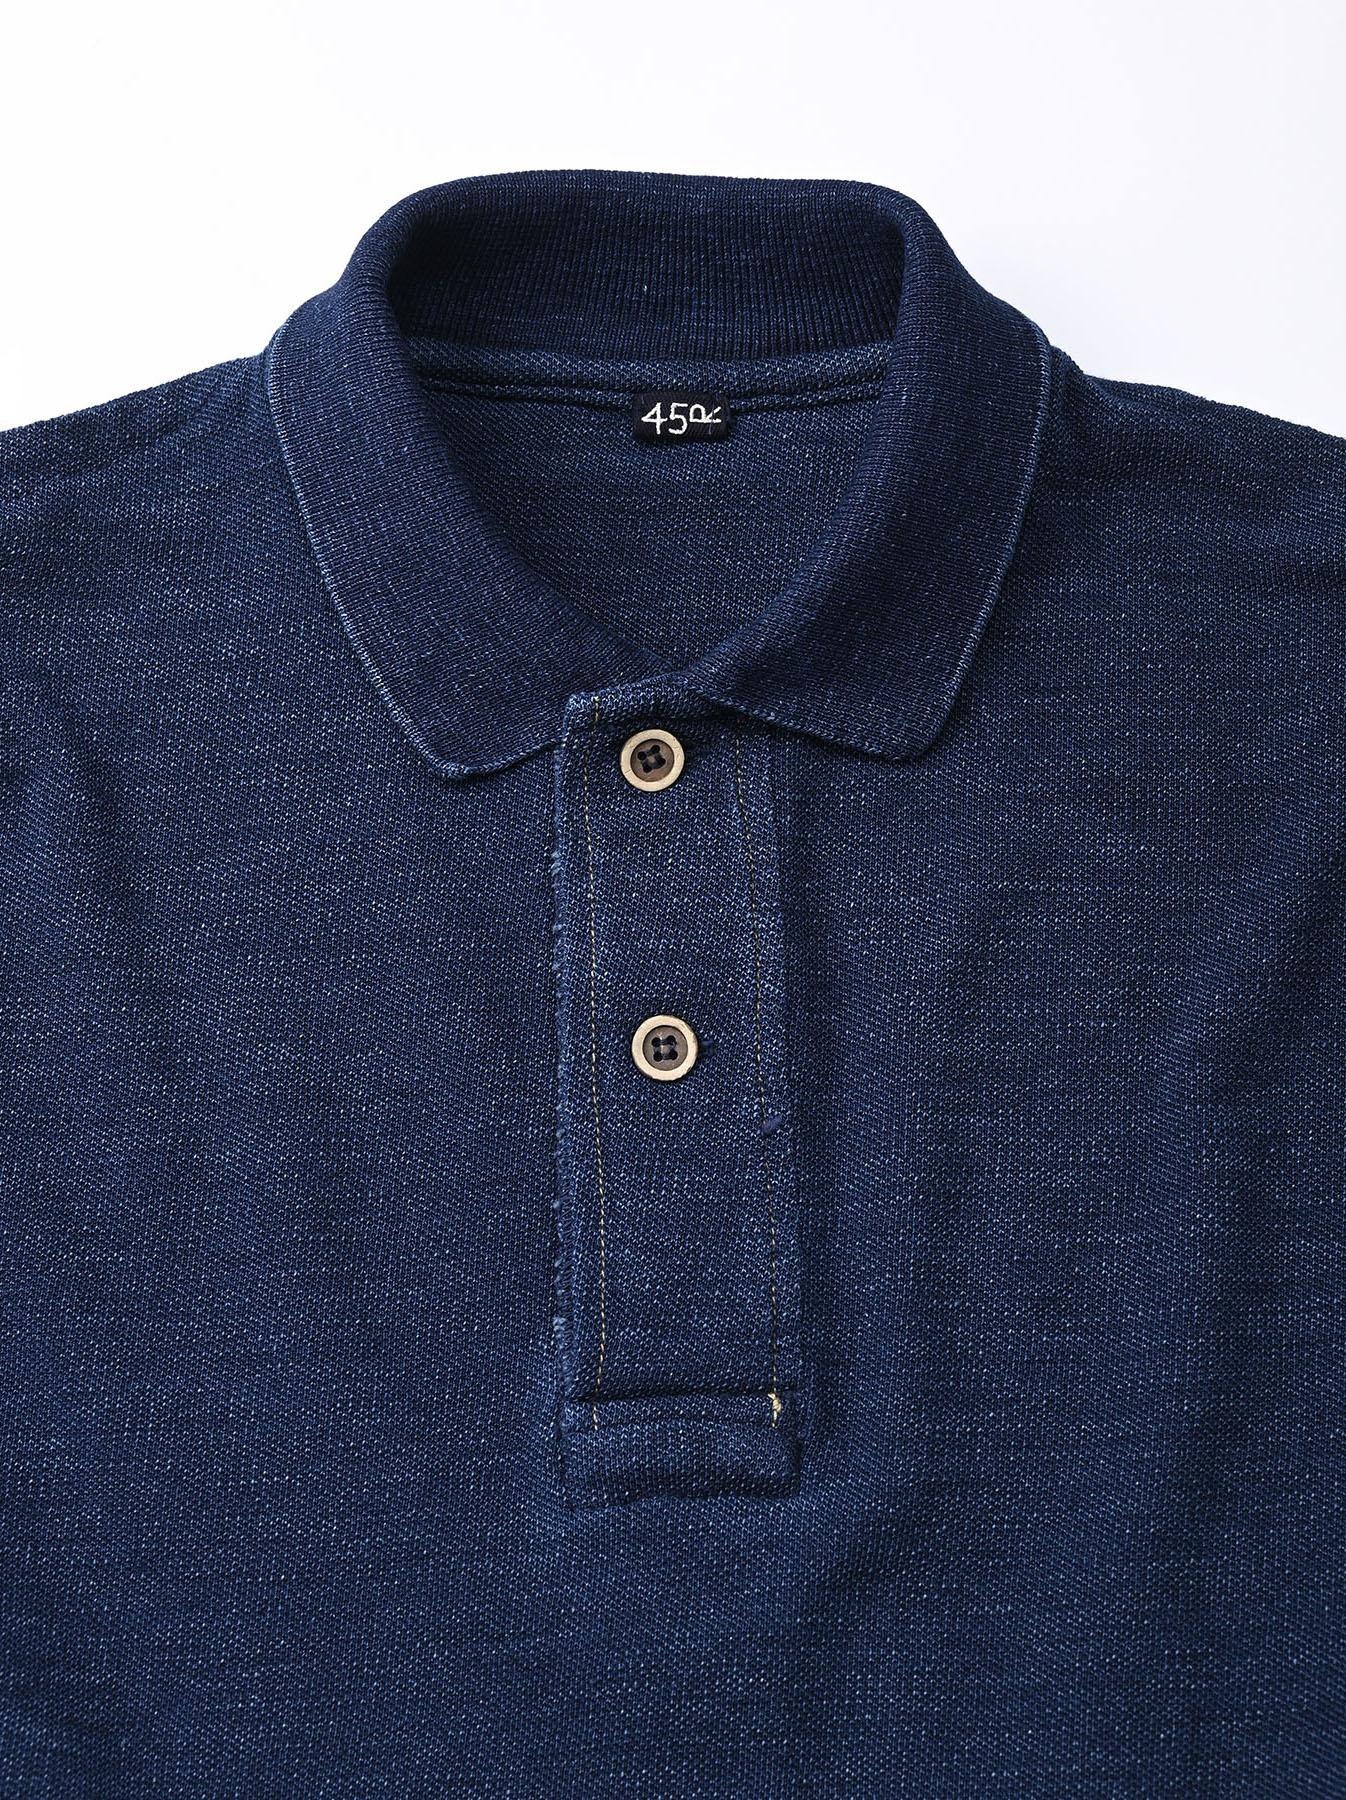 Indigo Kanoko Shiokaze Long-sleeved Square Polo Shirt (0521)-8